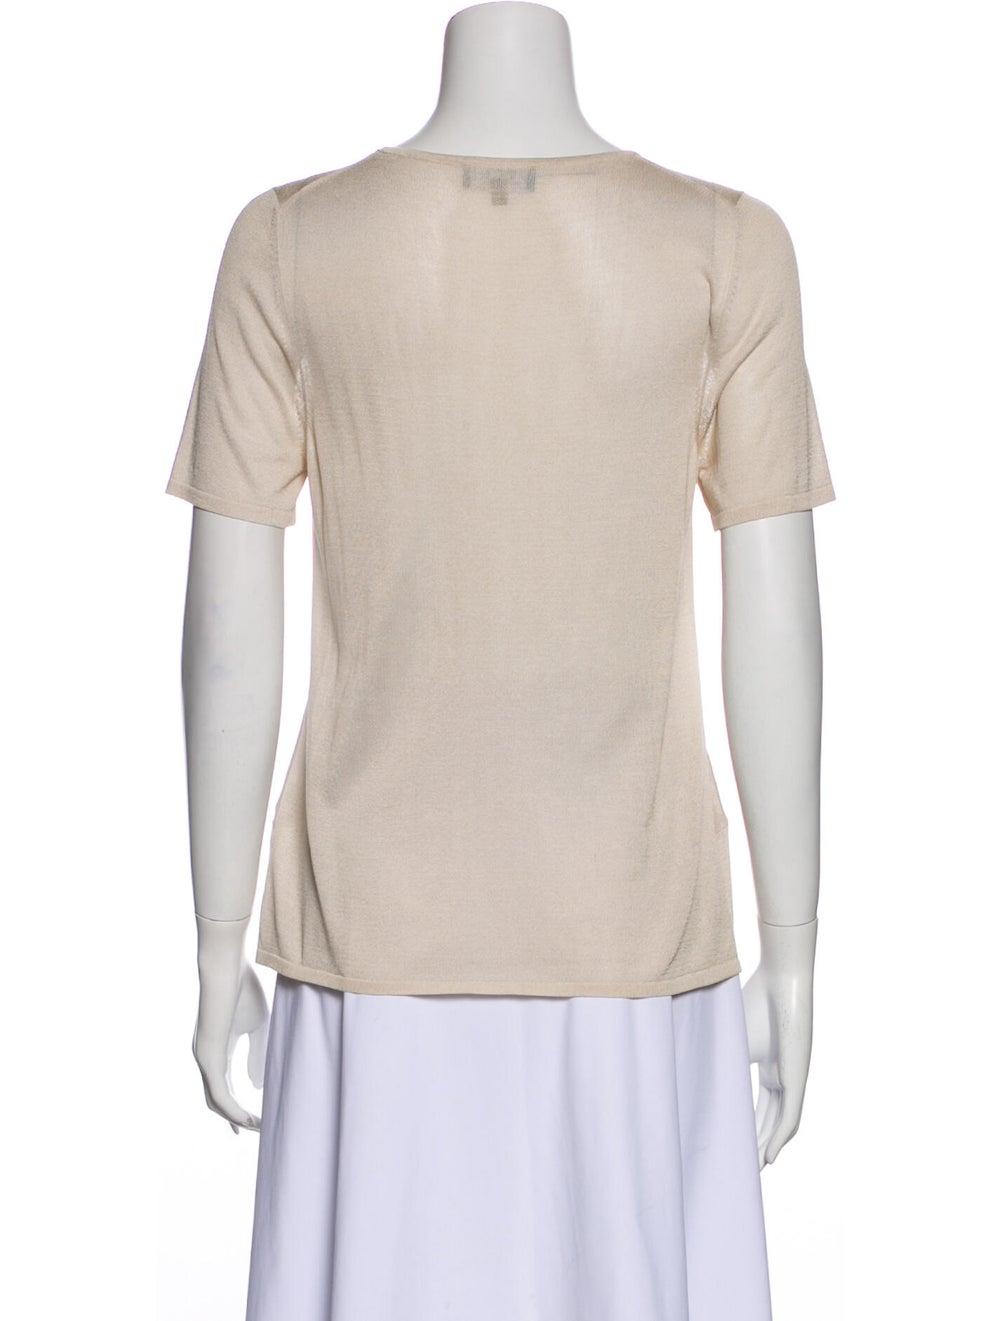 Gucci Vintage Silk T-Shirt - image 3